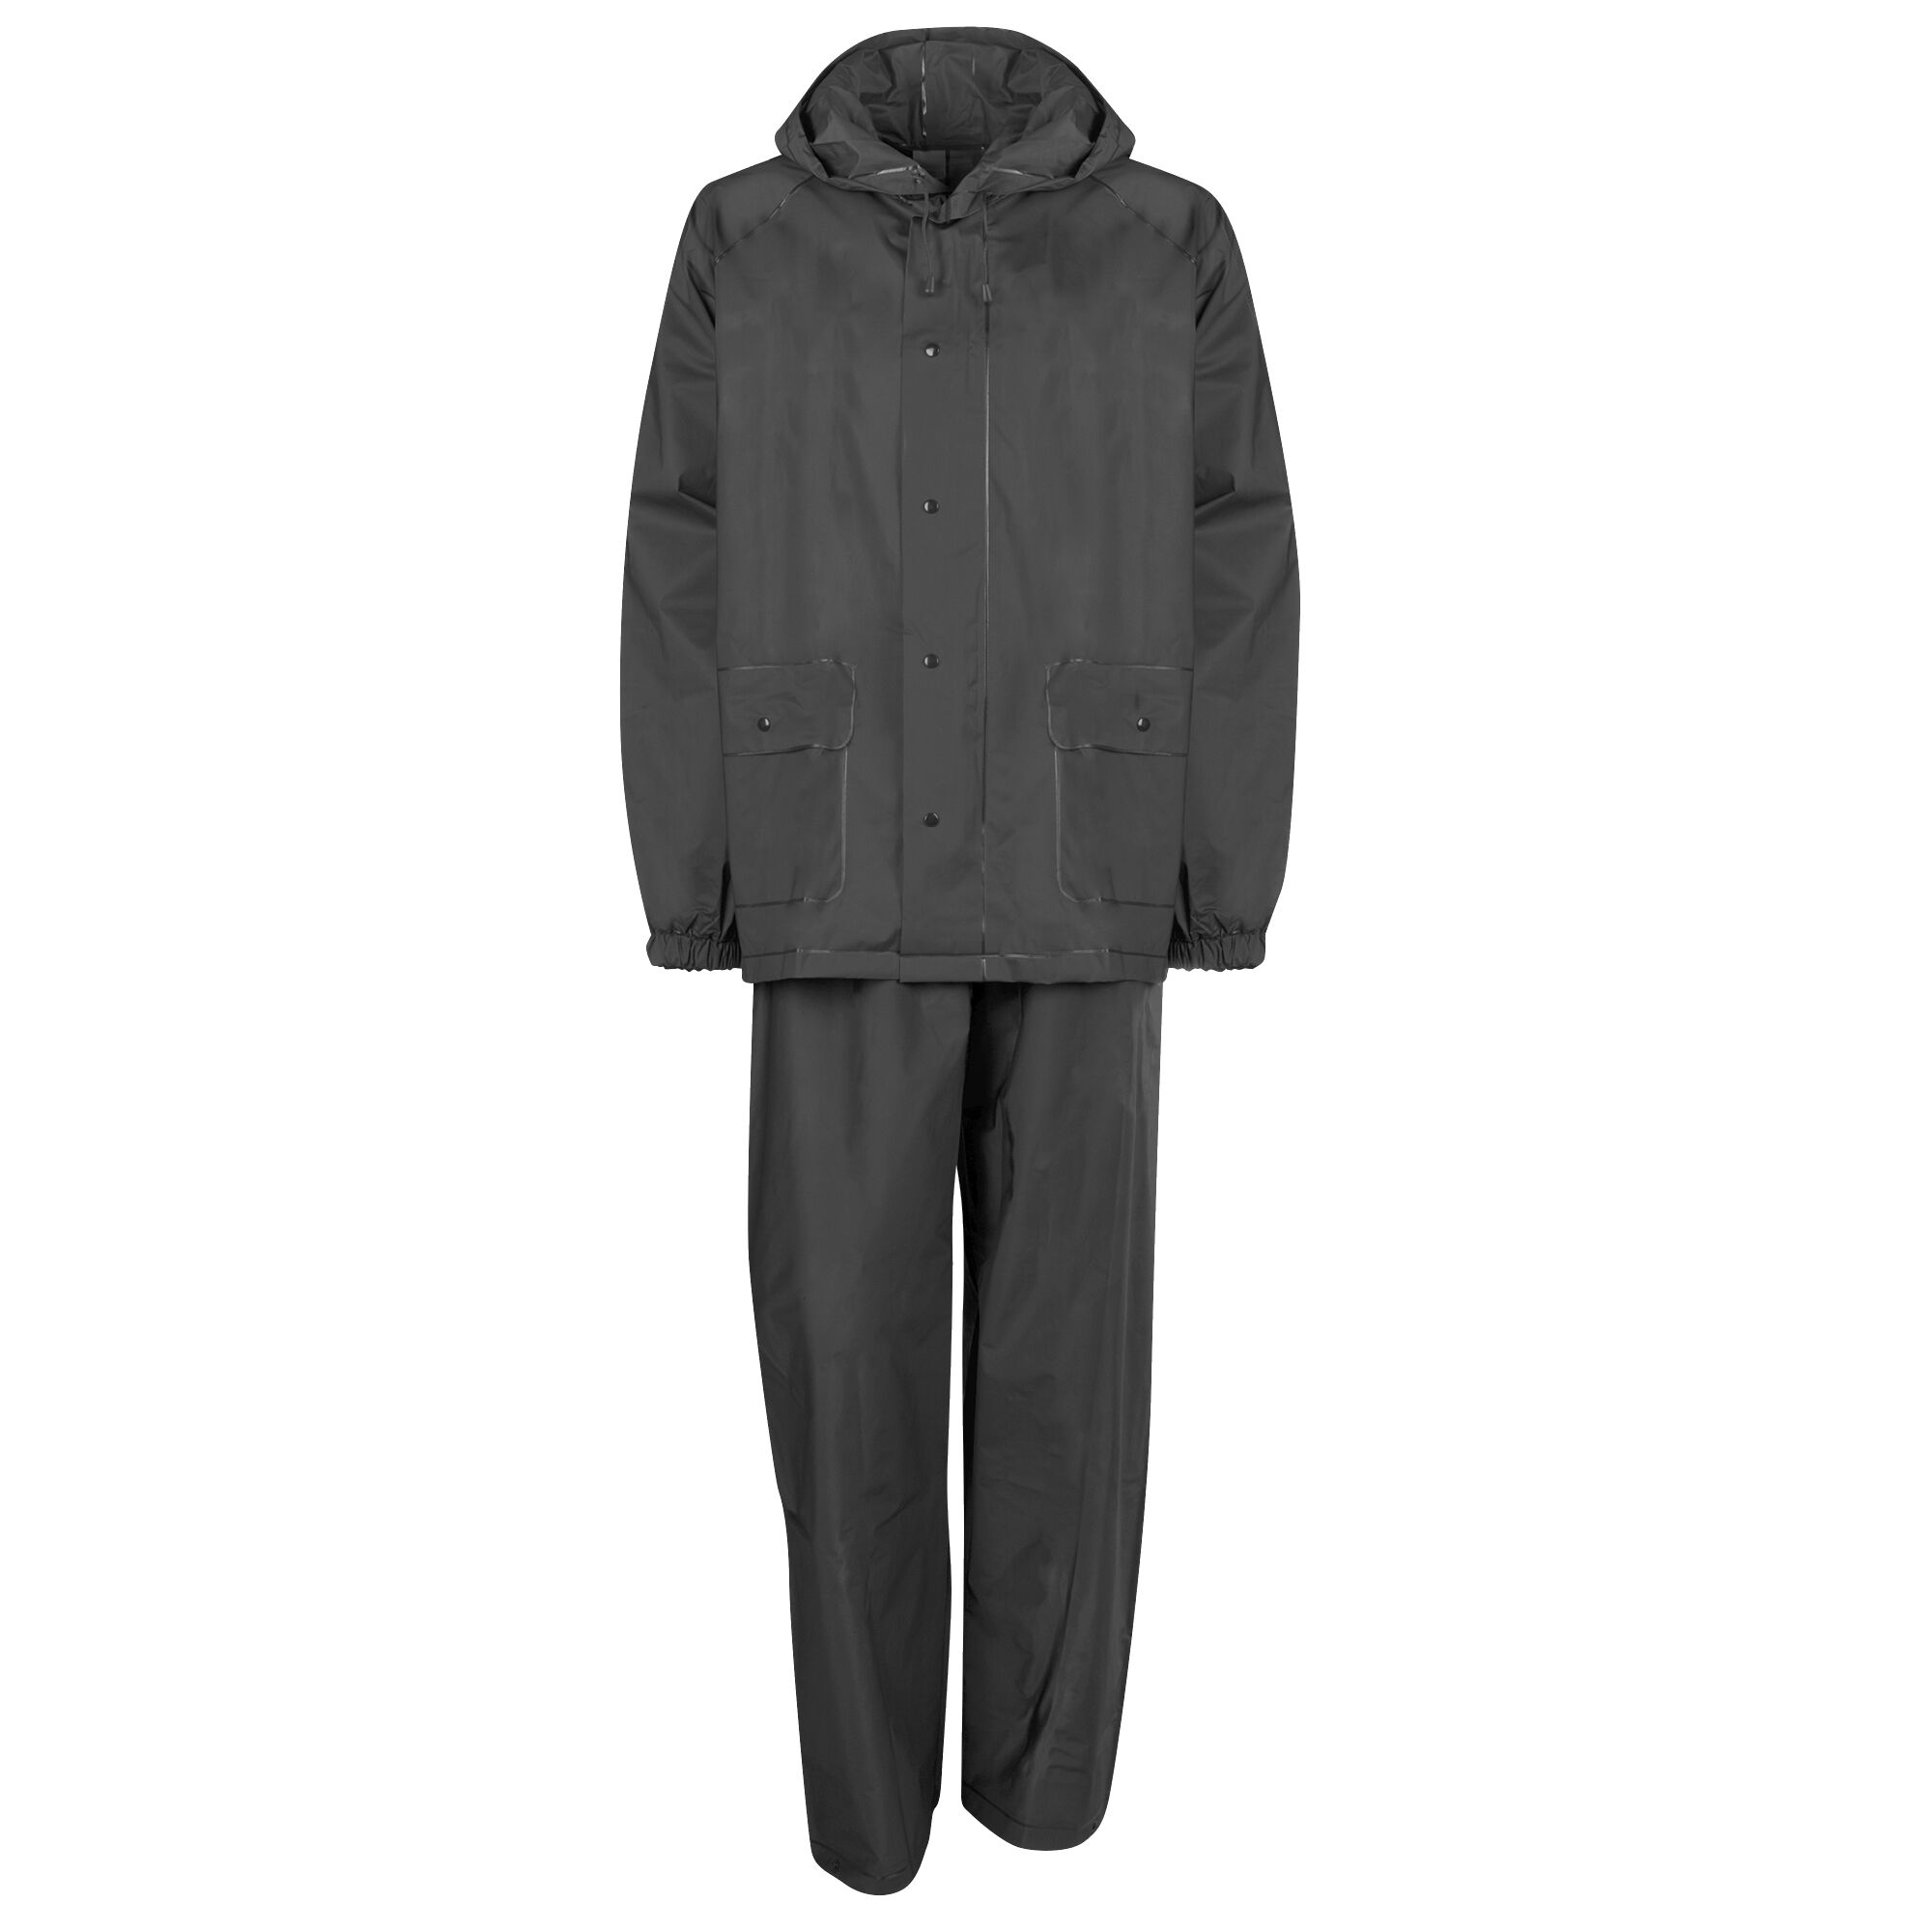 Ultimate Survival Technologies All-Weather Rain Suit Gray Adult Large Unisex